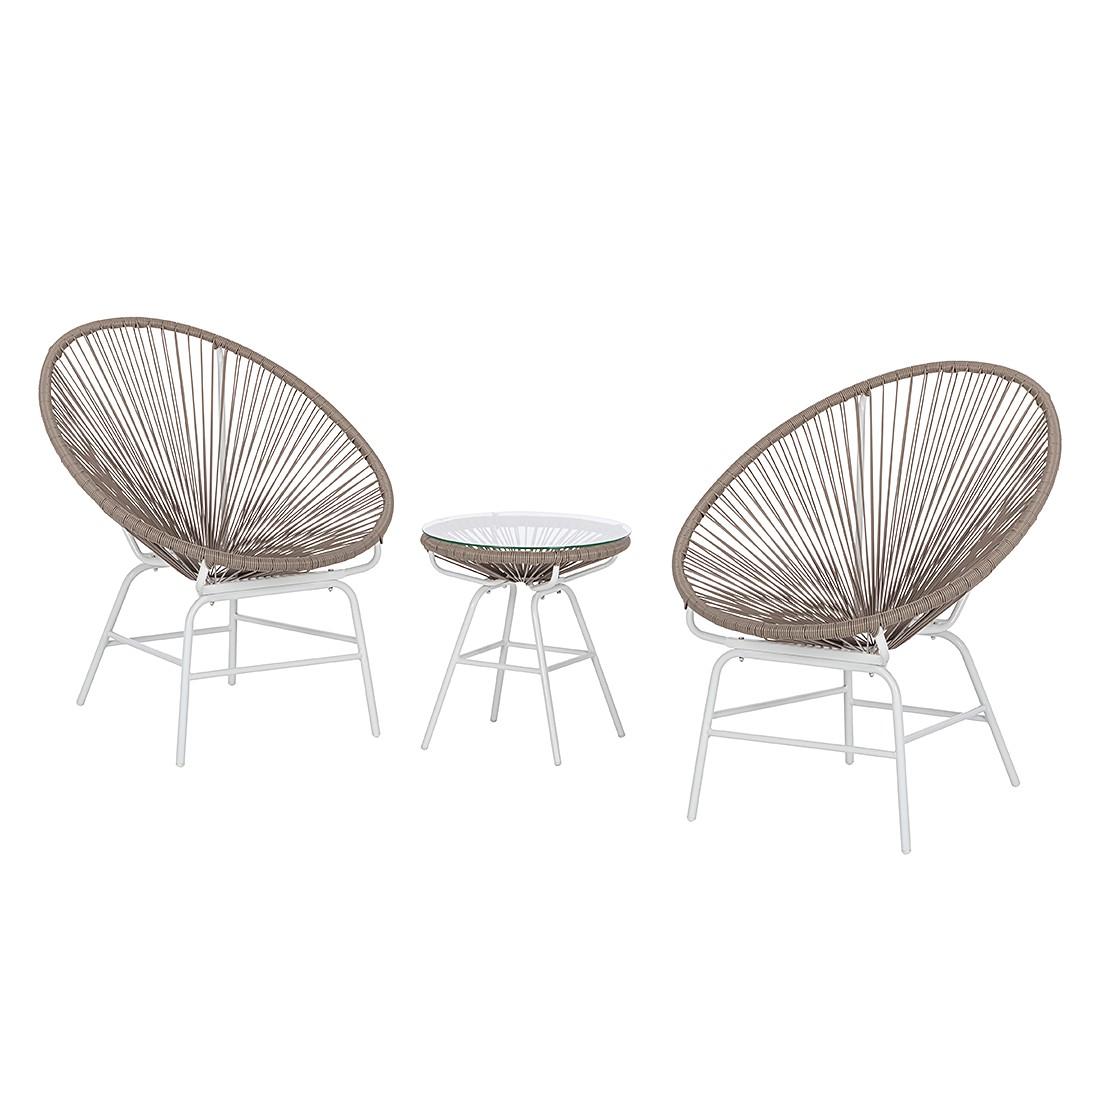 Sitzgruppe Copacabana II (3-teilig) - Kunststoff - Khaki / Weiß, Garden Guerilla